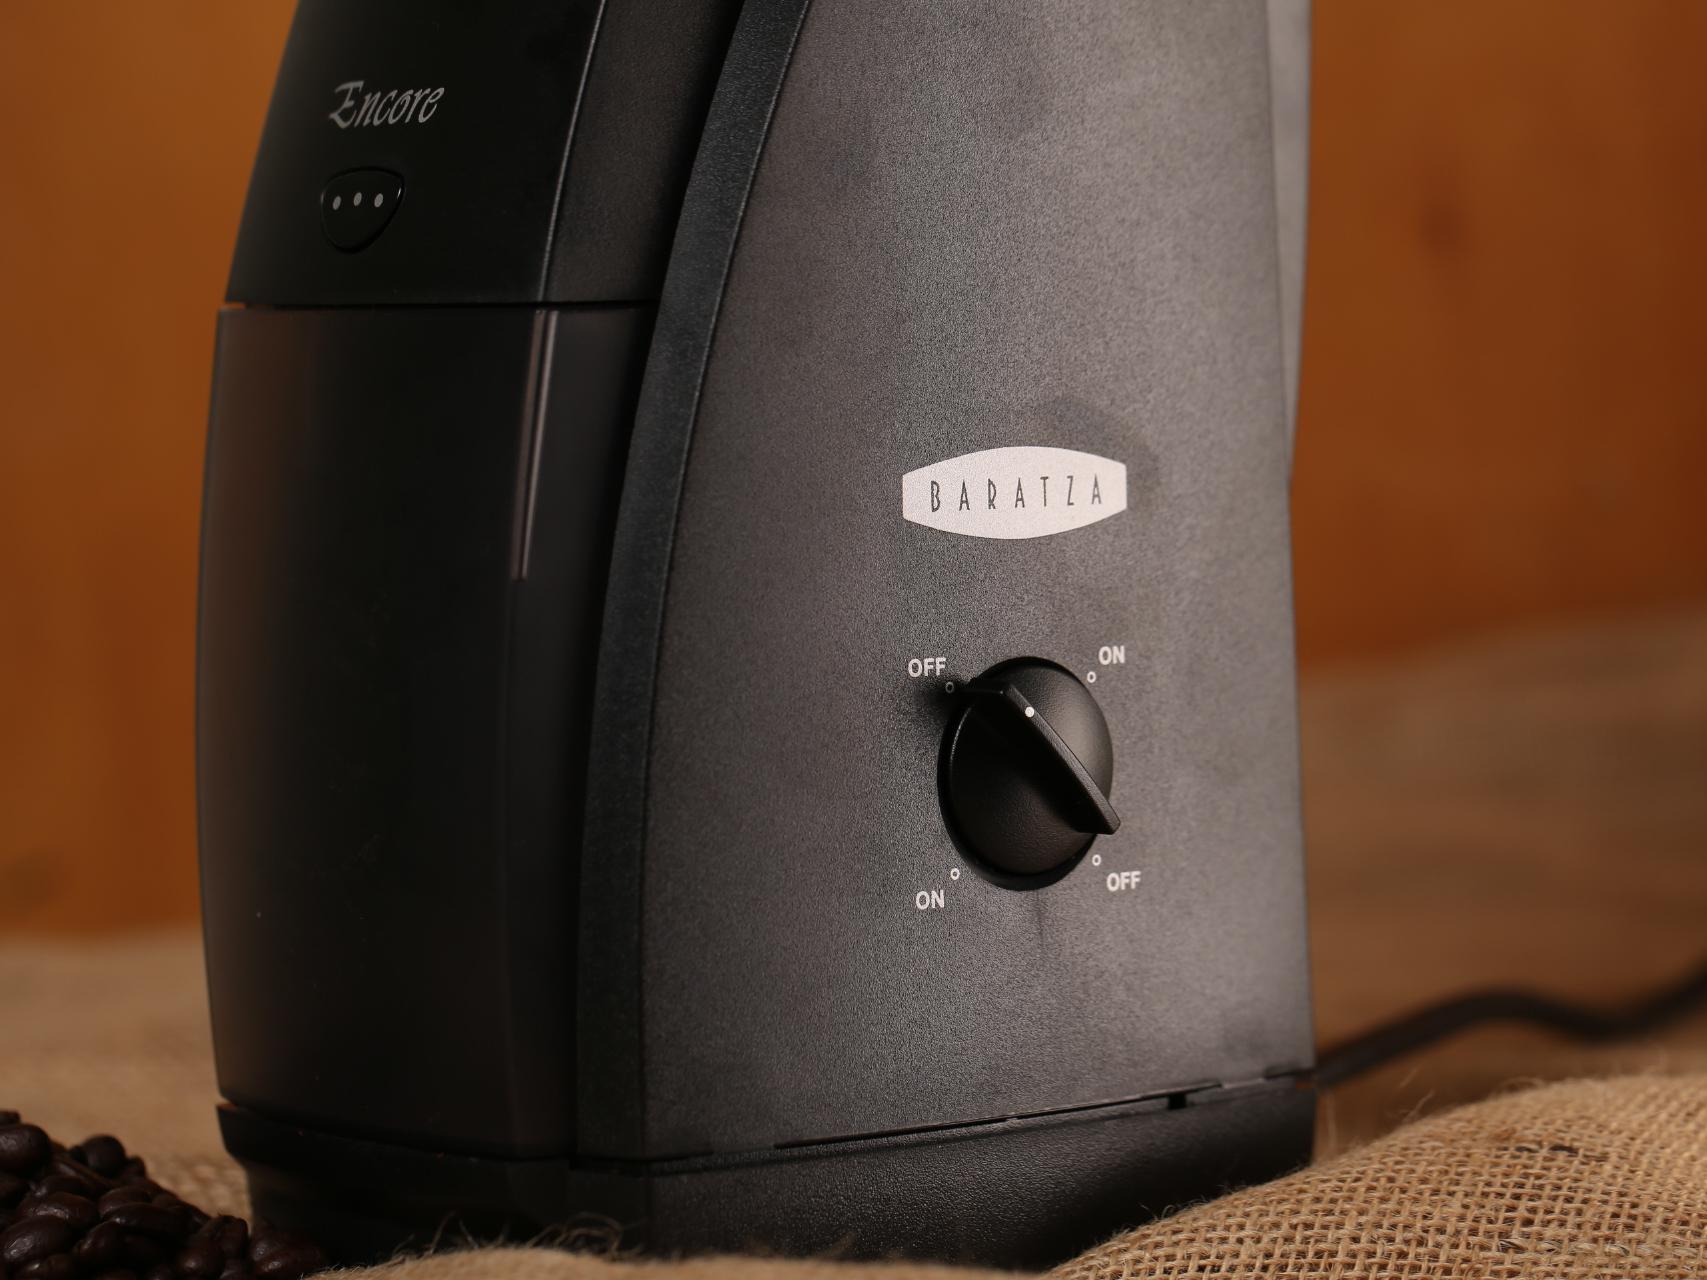 baratza-coffee-grinder-product-photos-1.jpg